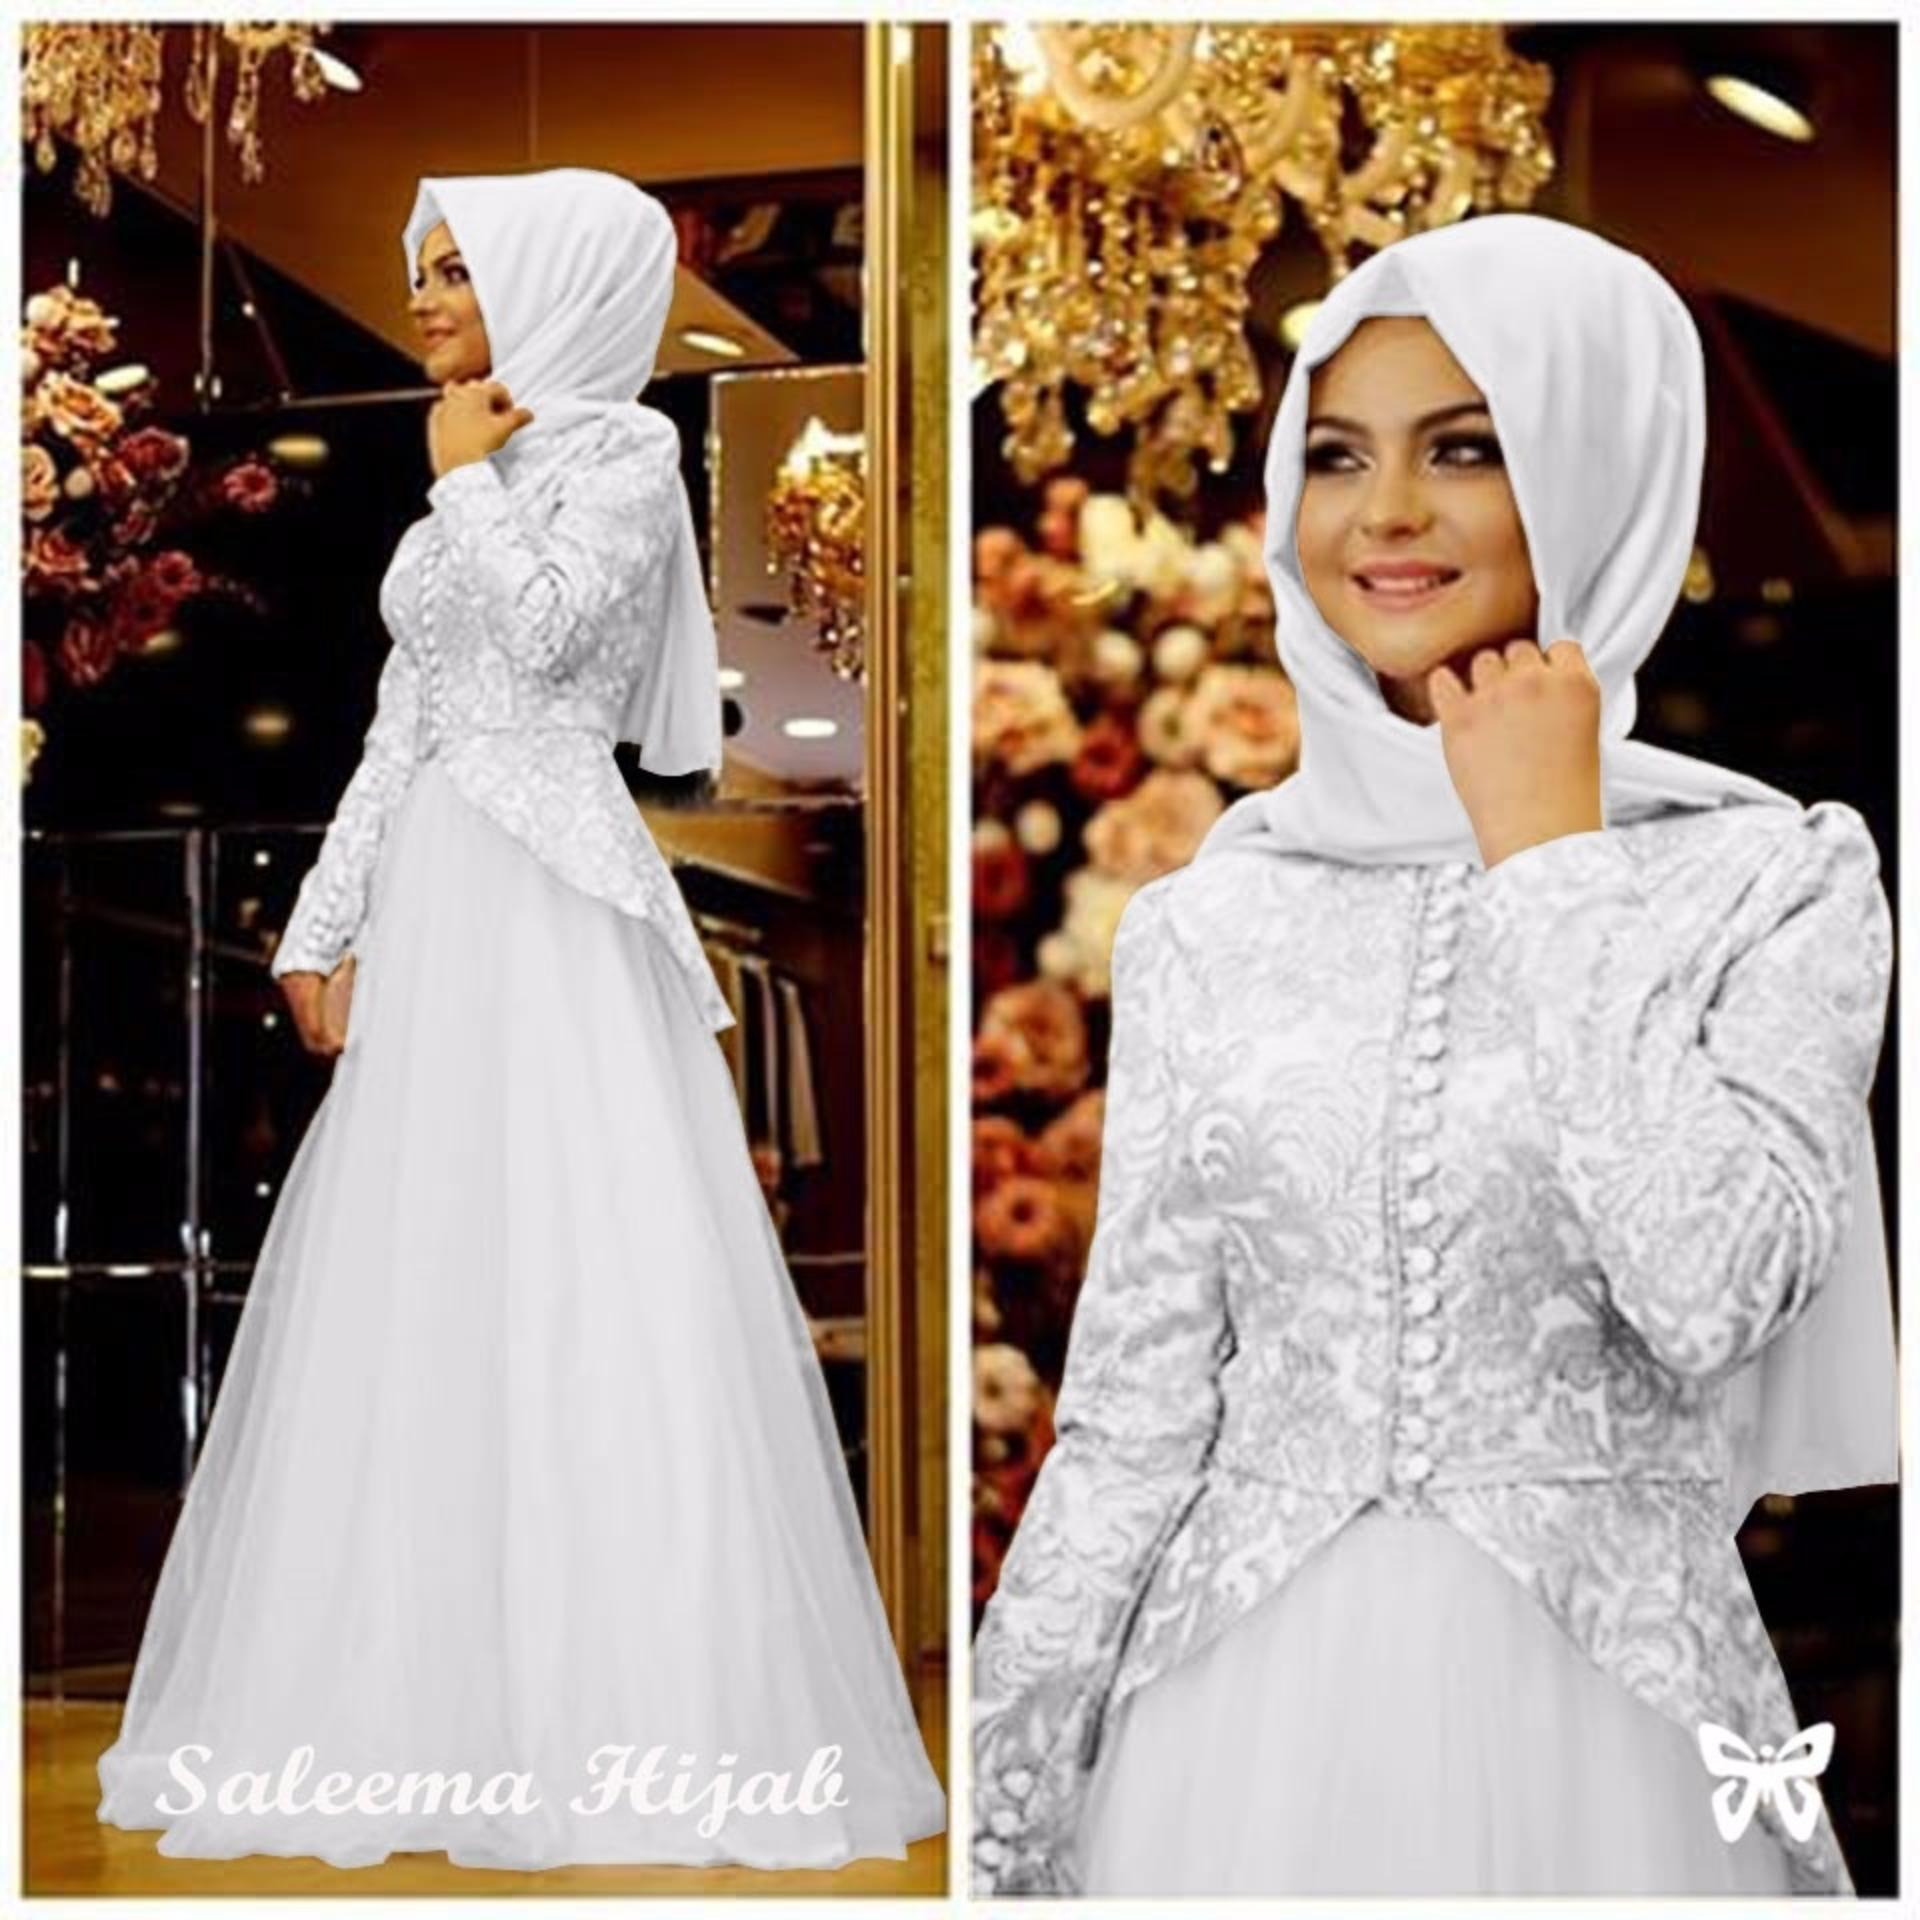 Flavia Store Polo Shirt Dress Lengan Pendek FS0396 - ABU-ABU / Gaun Kaos Wanita. Source · Pakaian Muslimah Wanita Fashionable - Gamis Salema